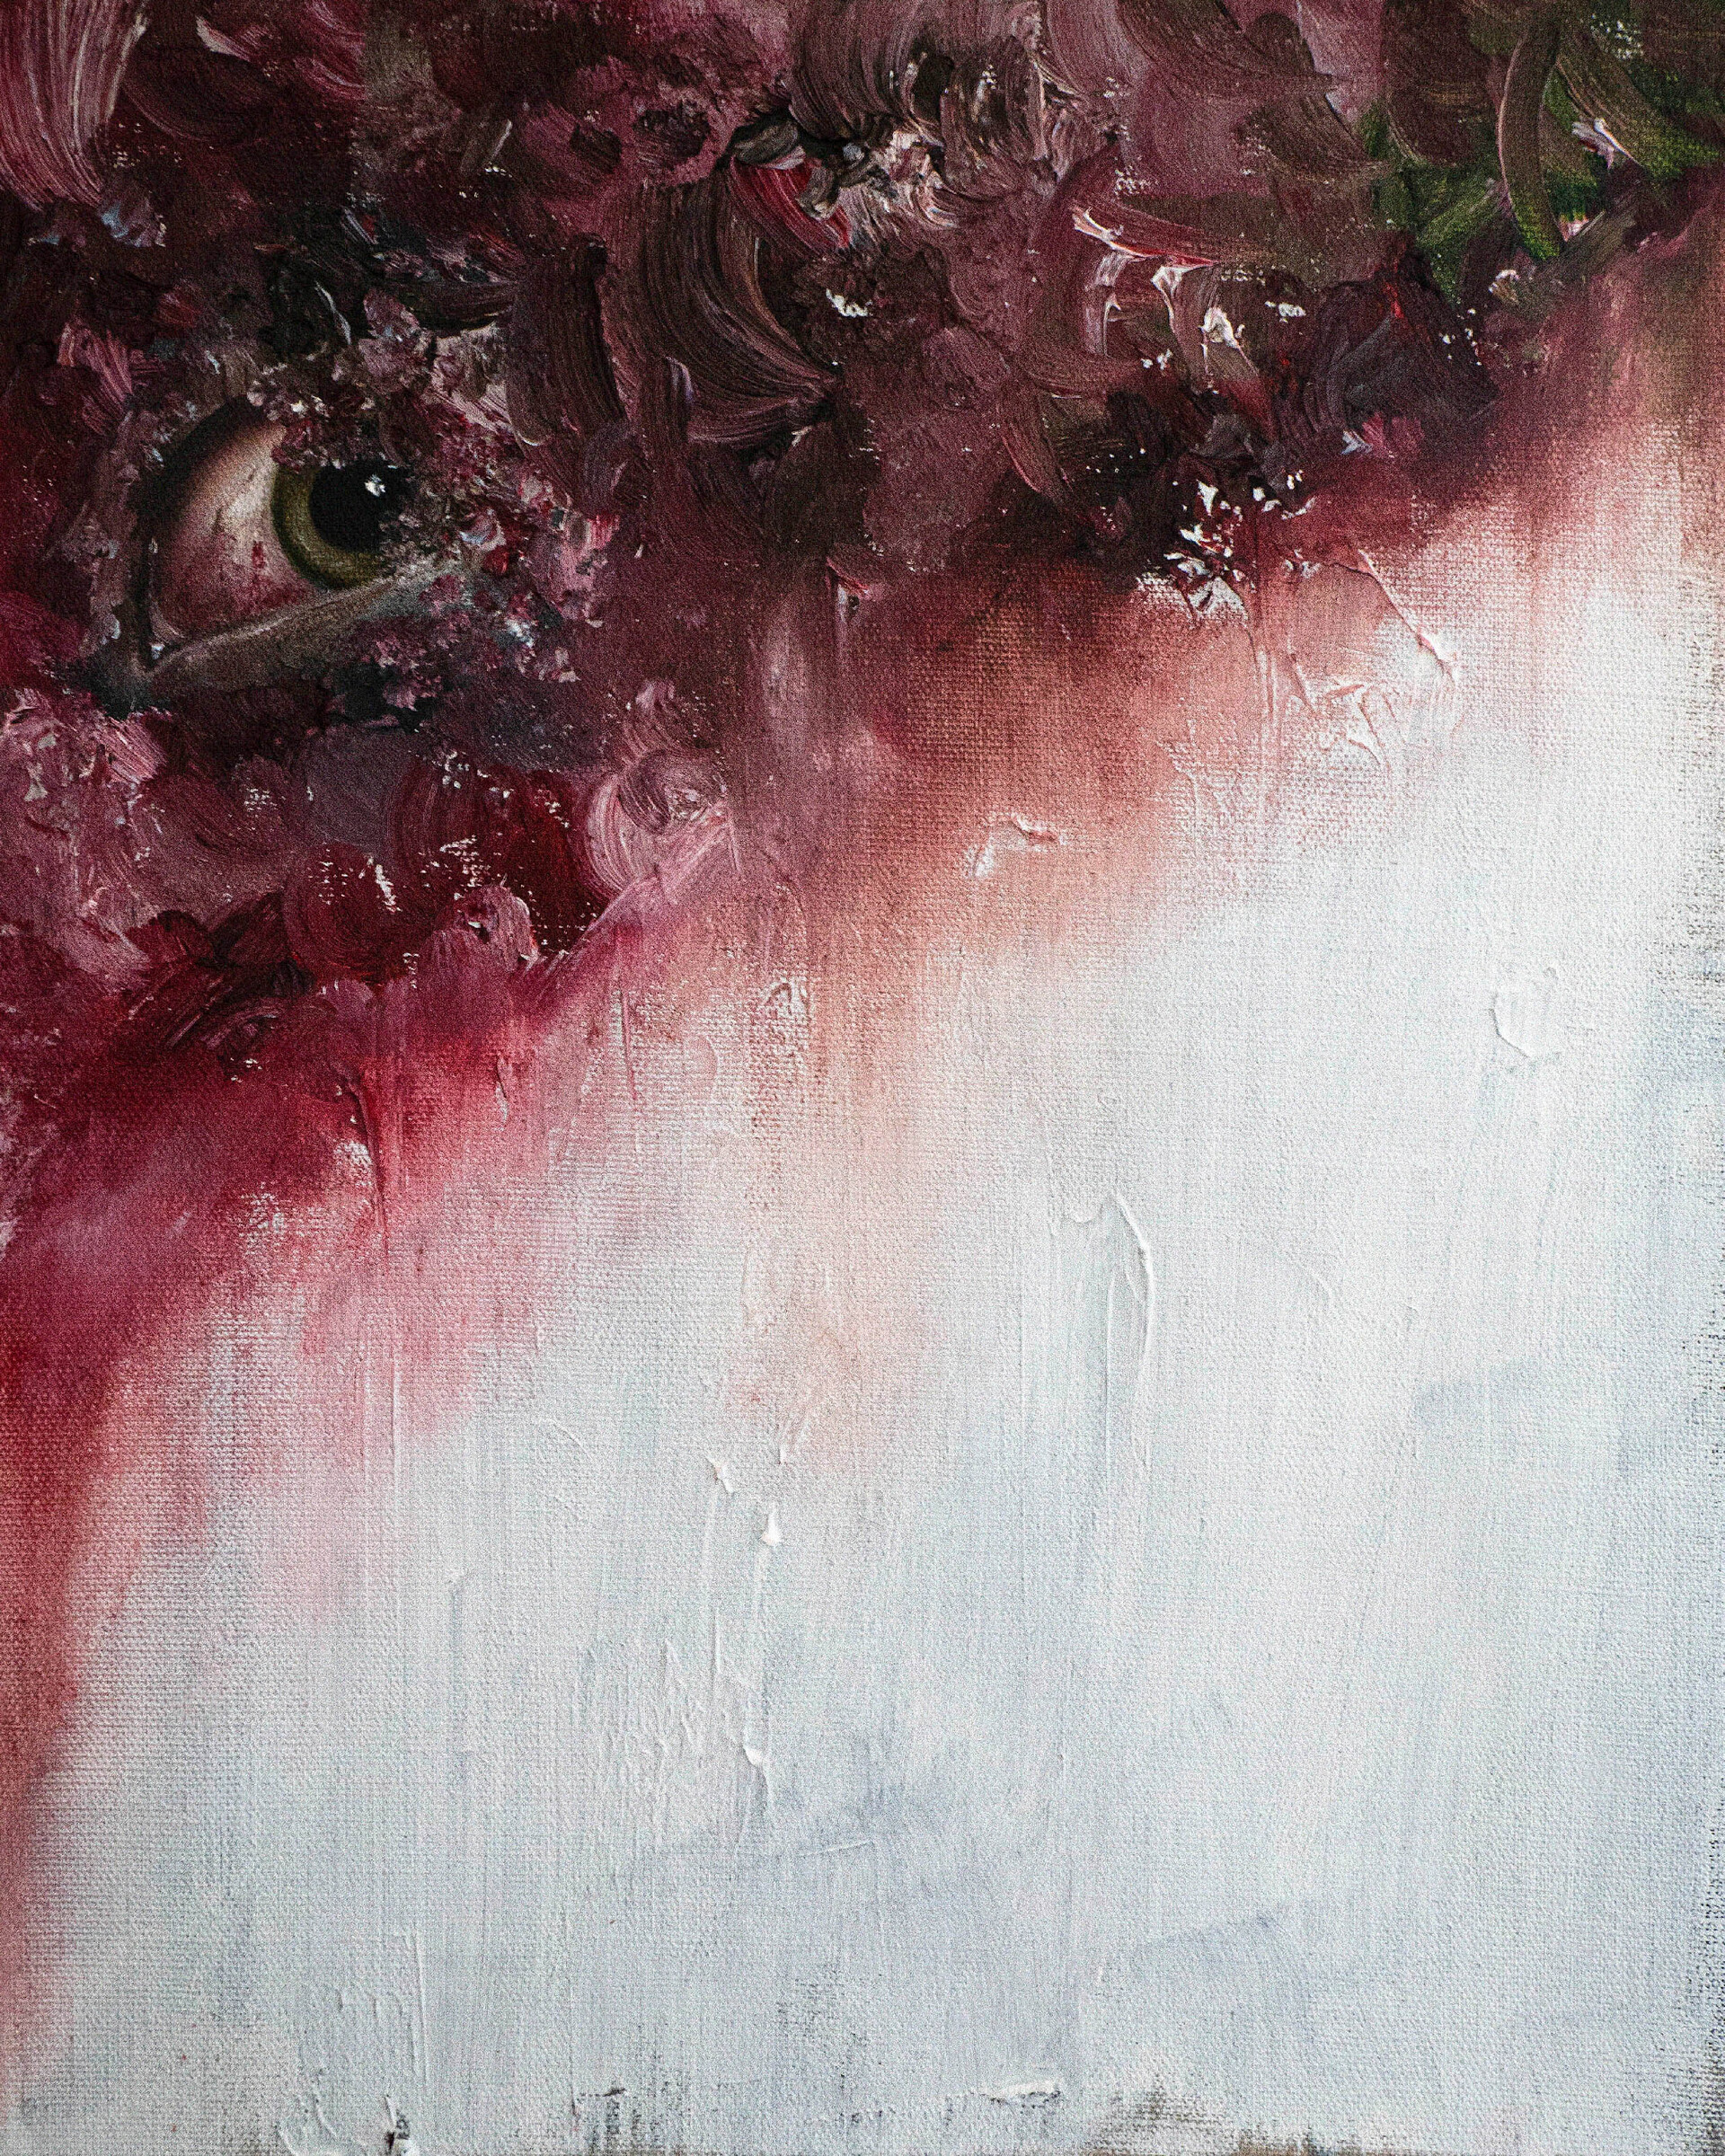 Buried in Flesh (Oils).